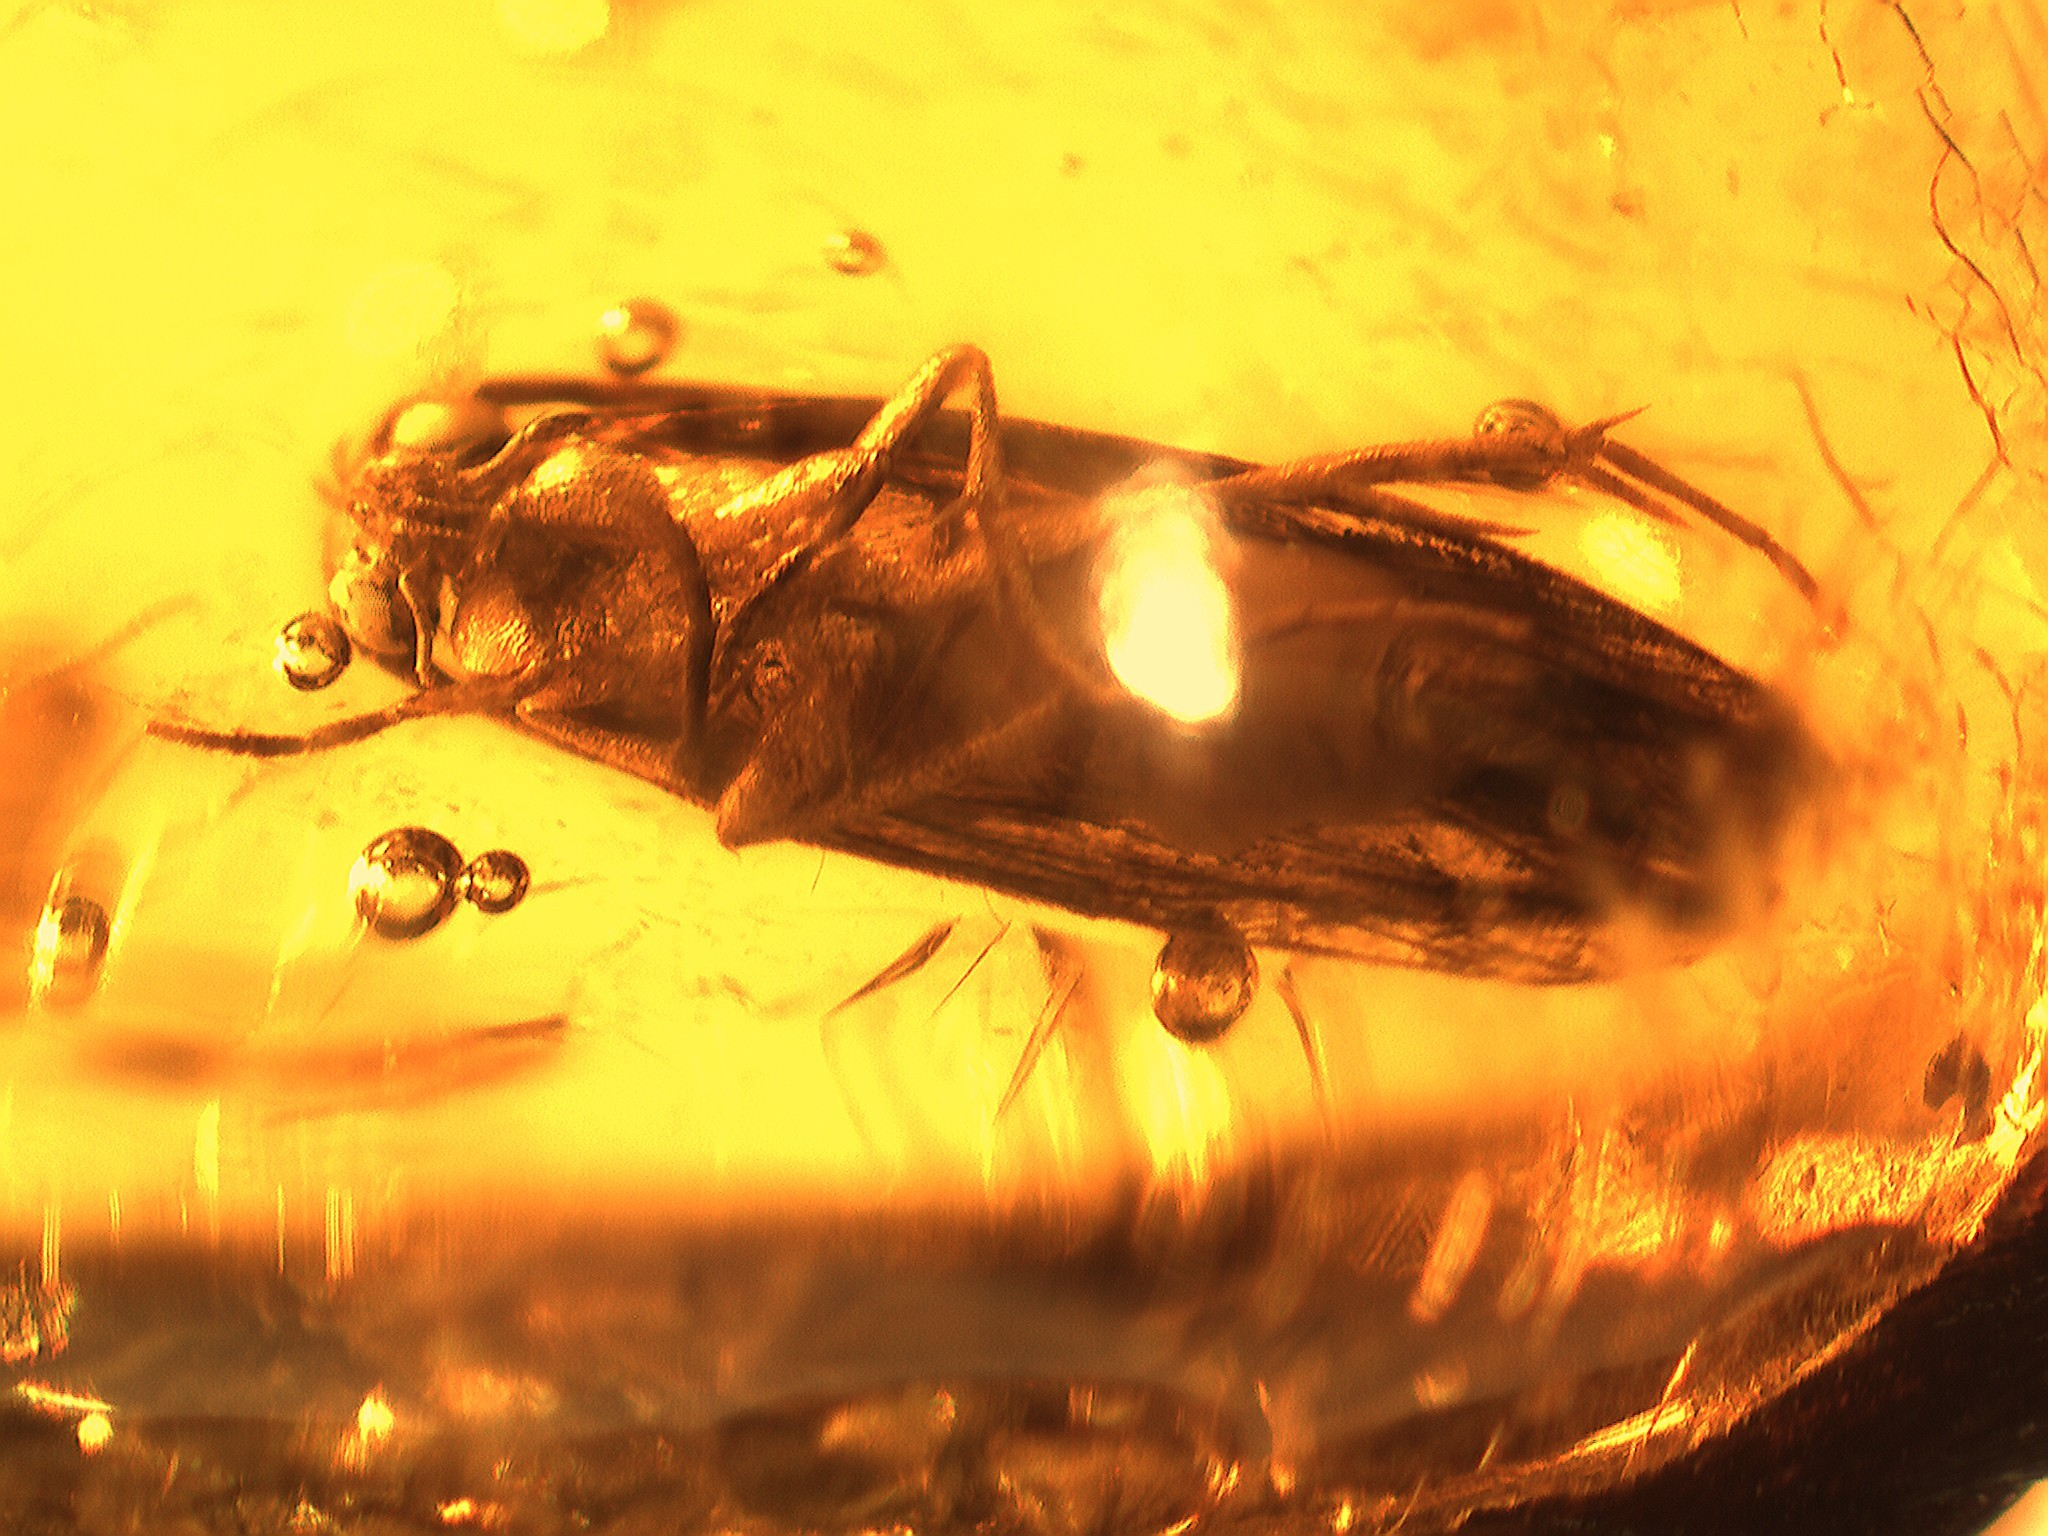 Lizard in Chiapas amber